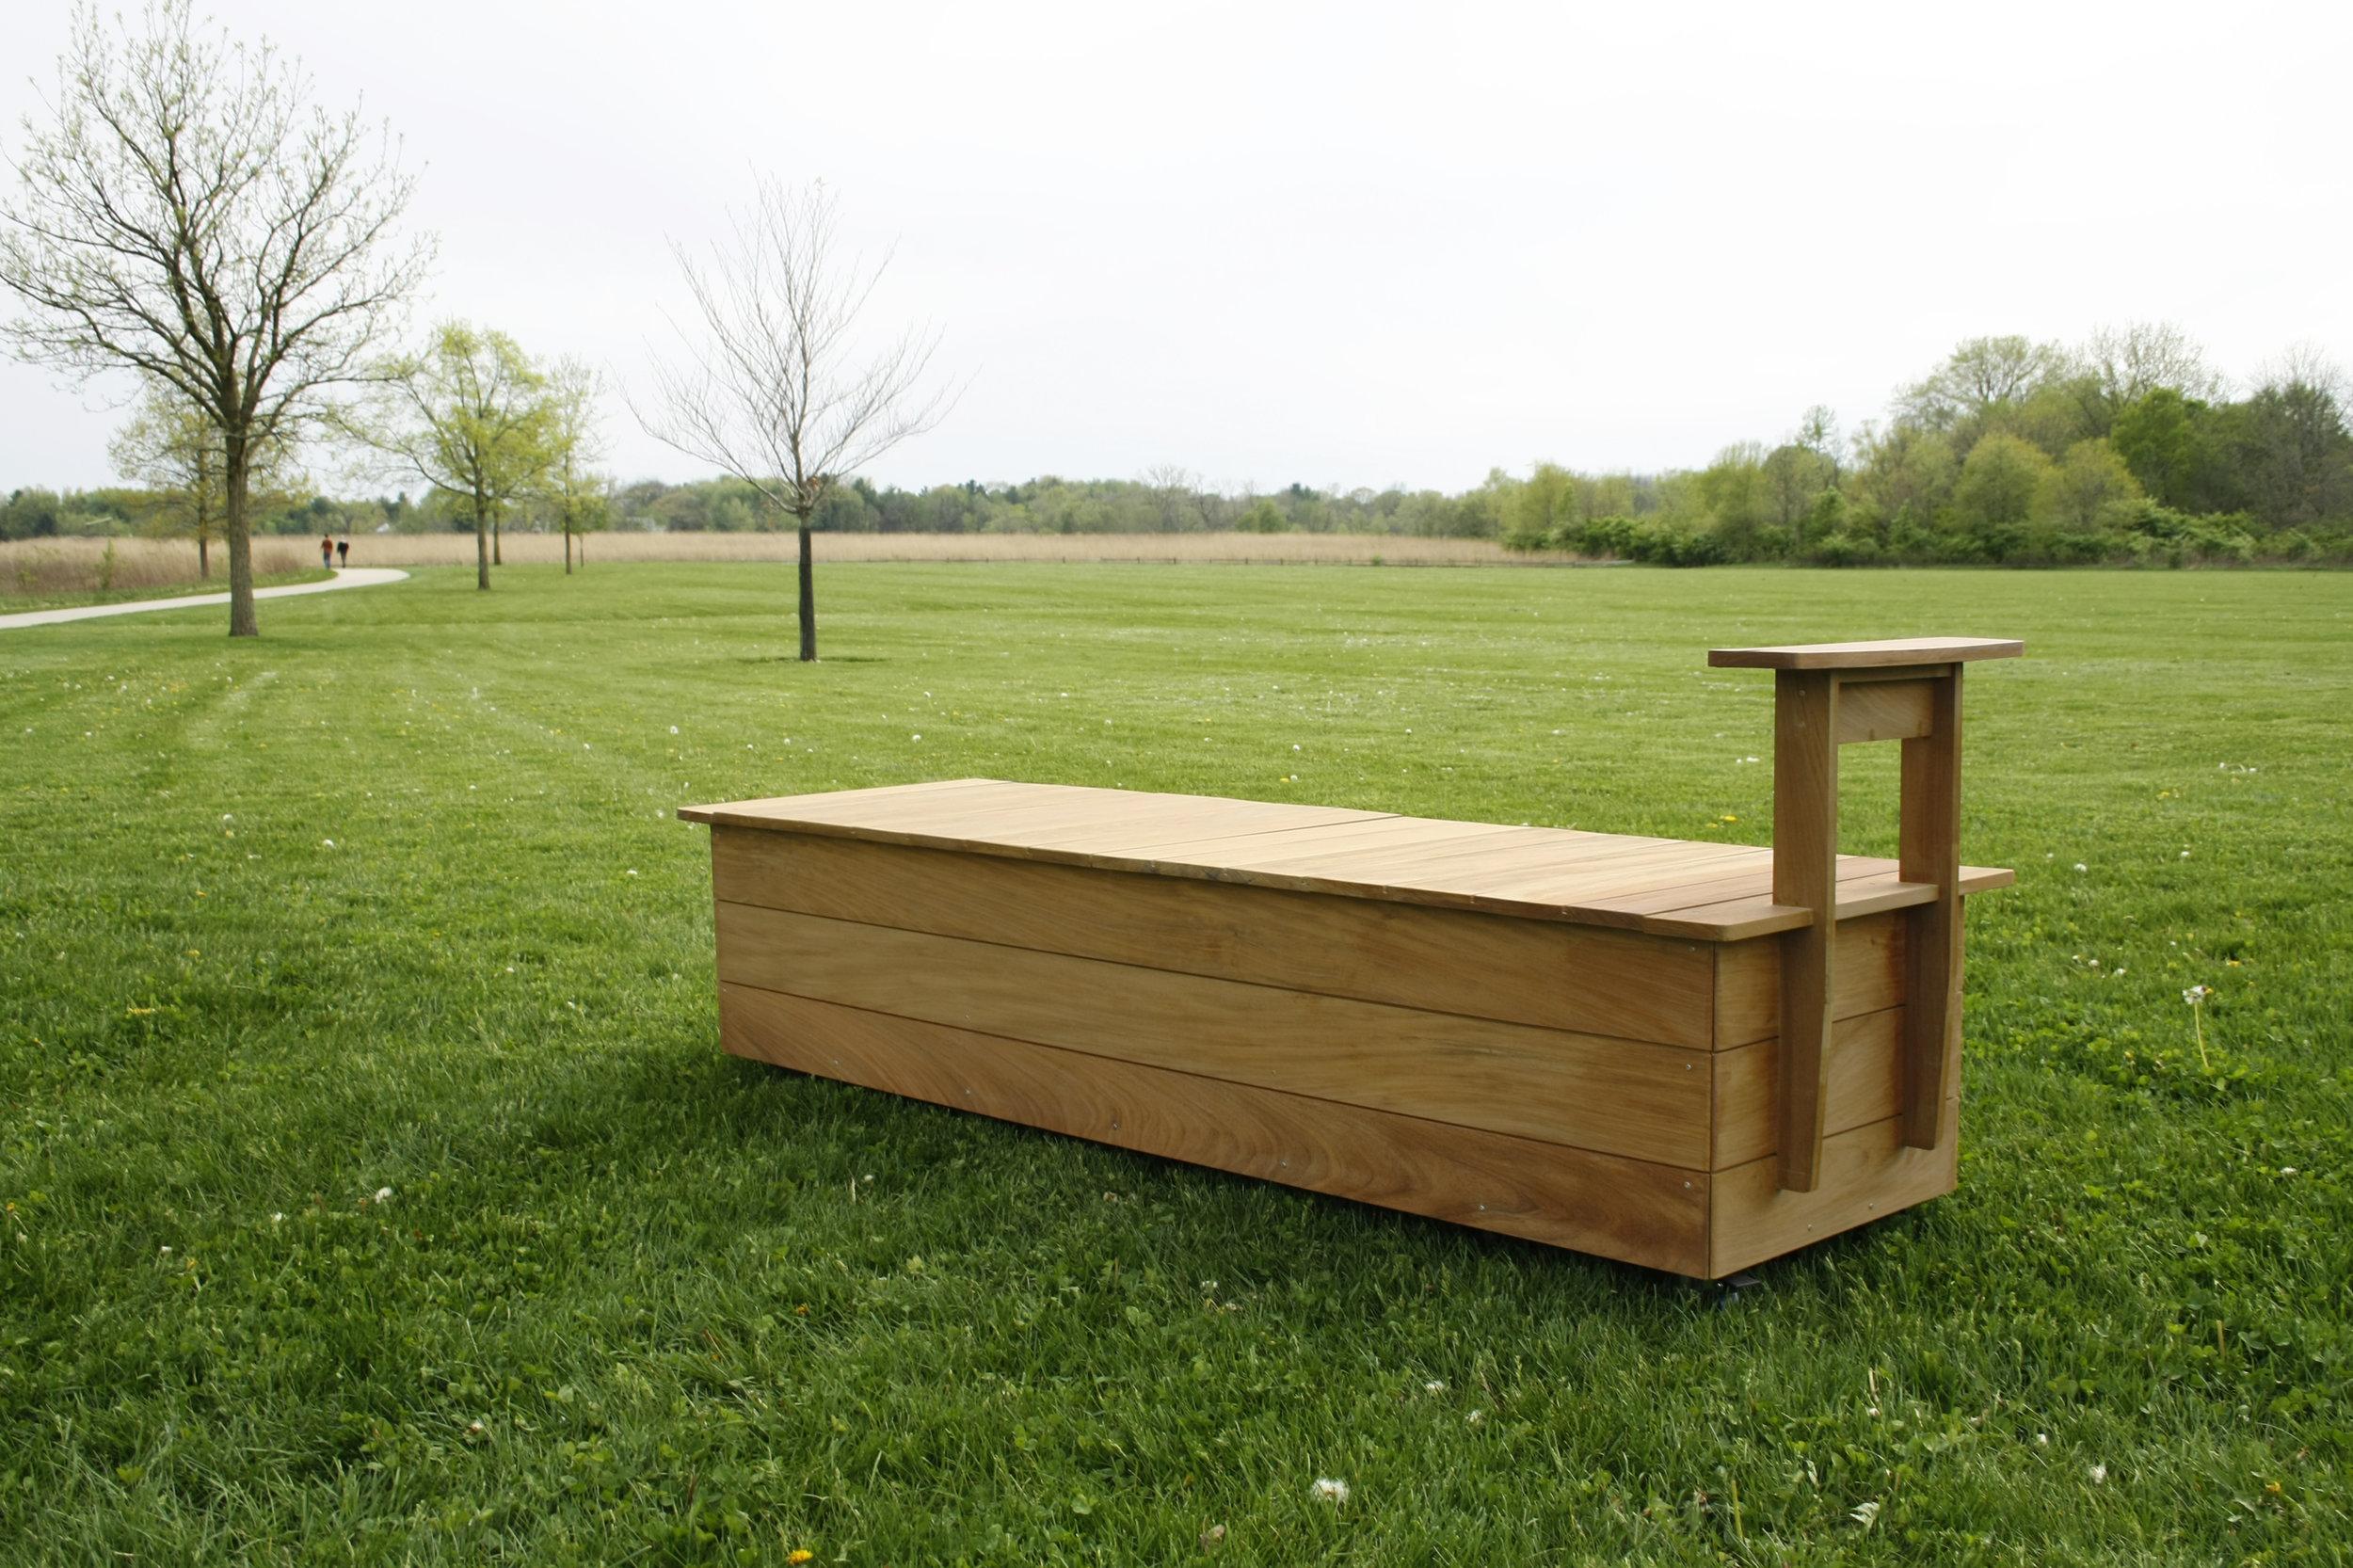 norden-at-home-custom-furniture-recycling-bench-header.jpg